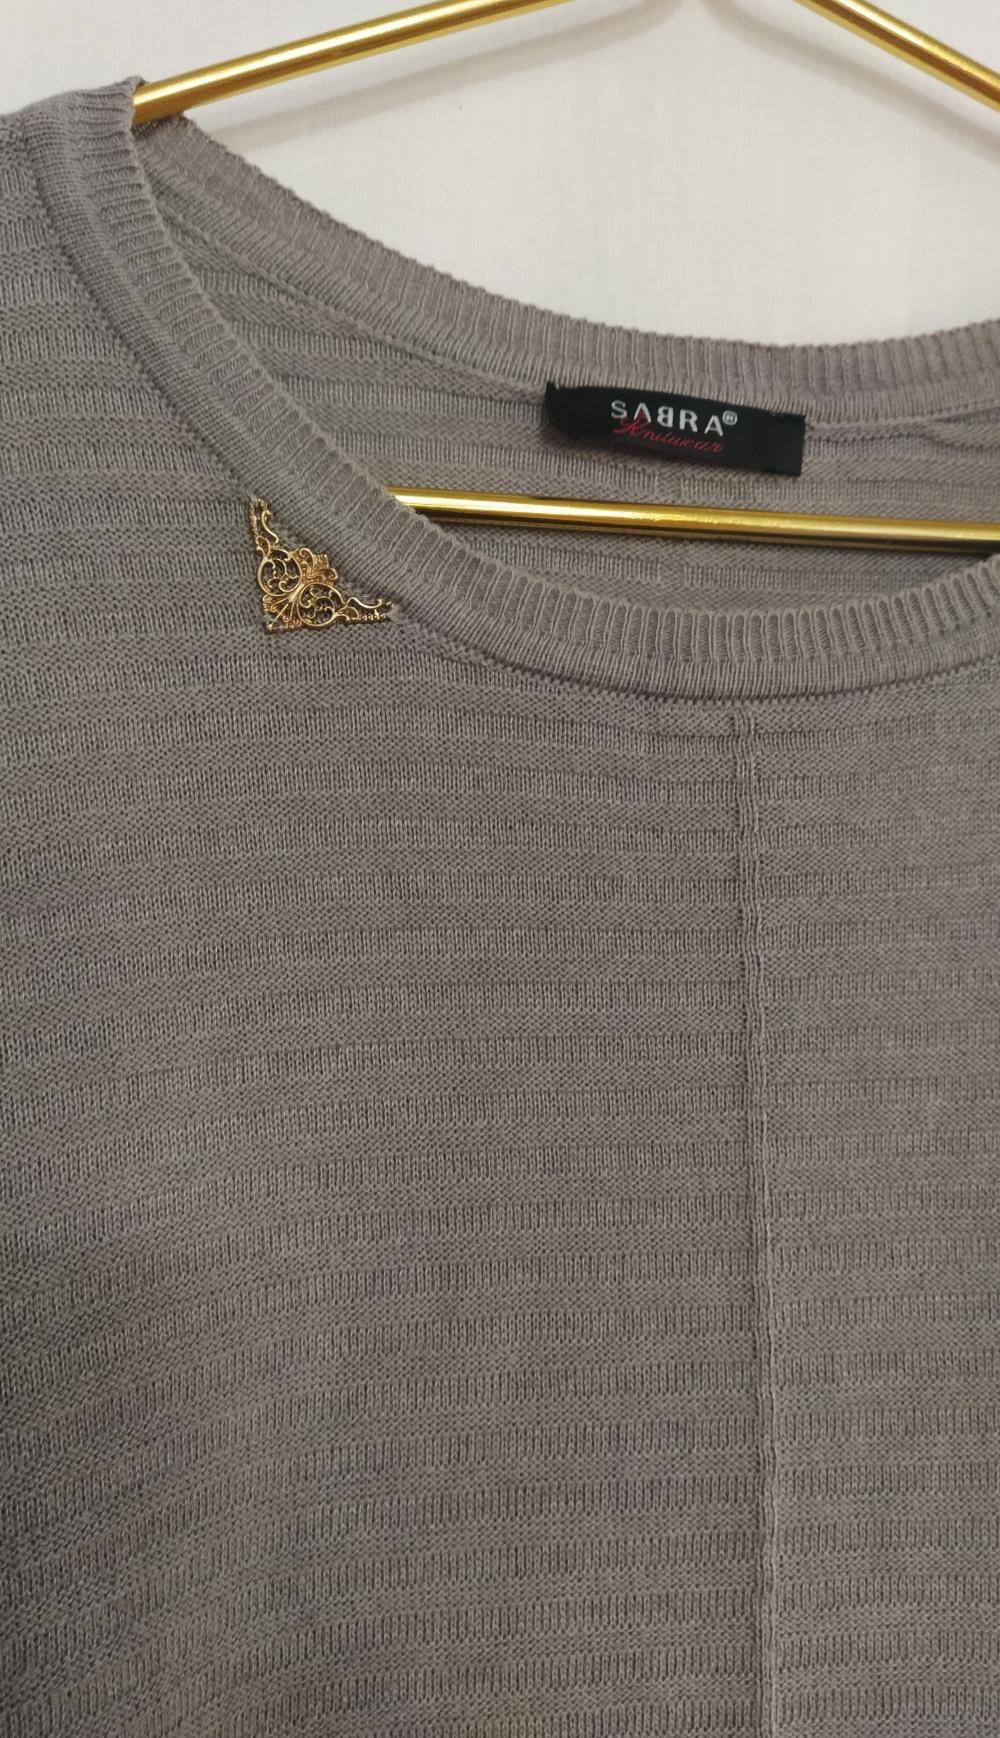 Свитер Sabra, one size.